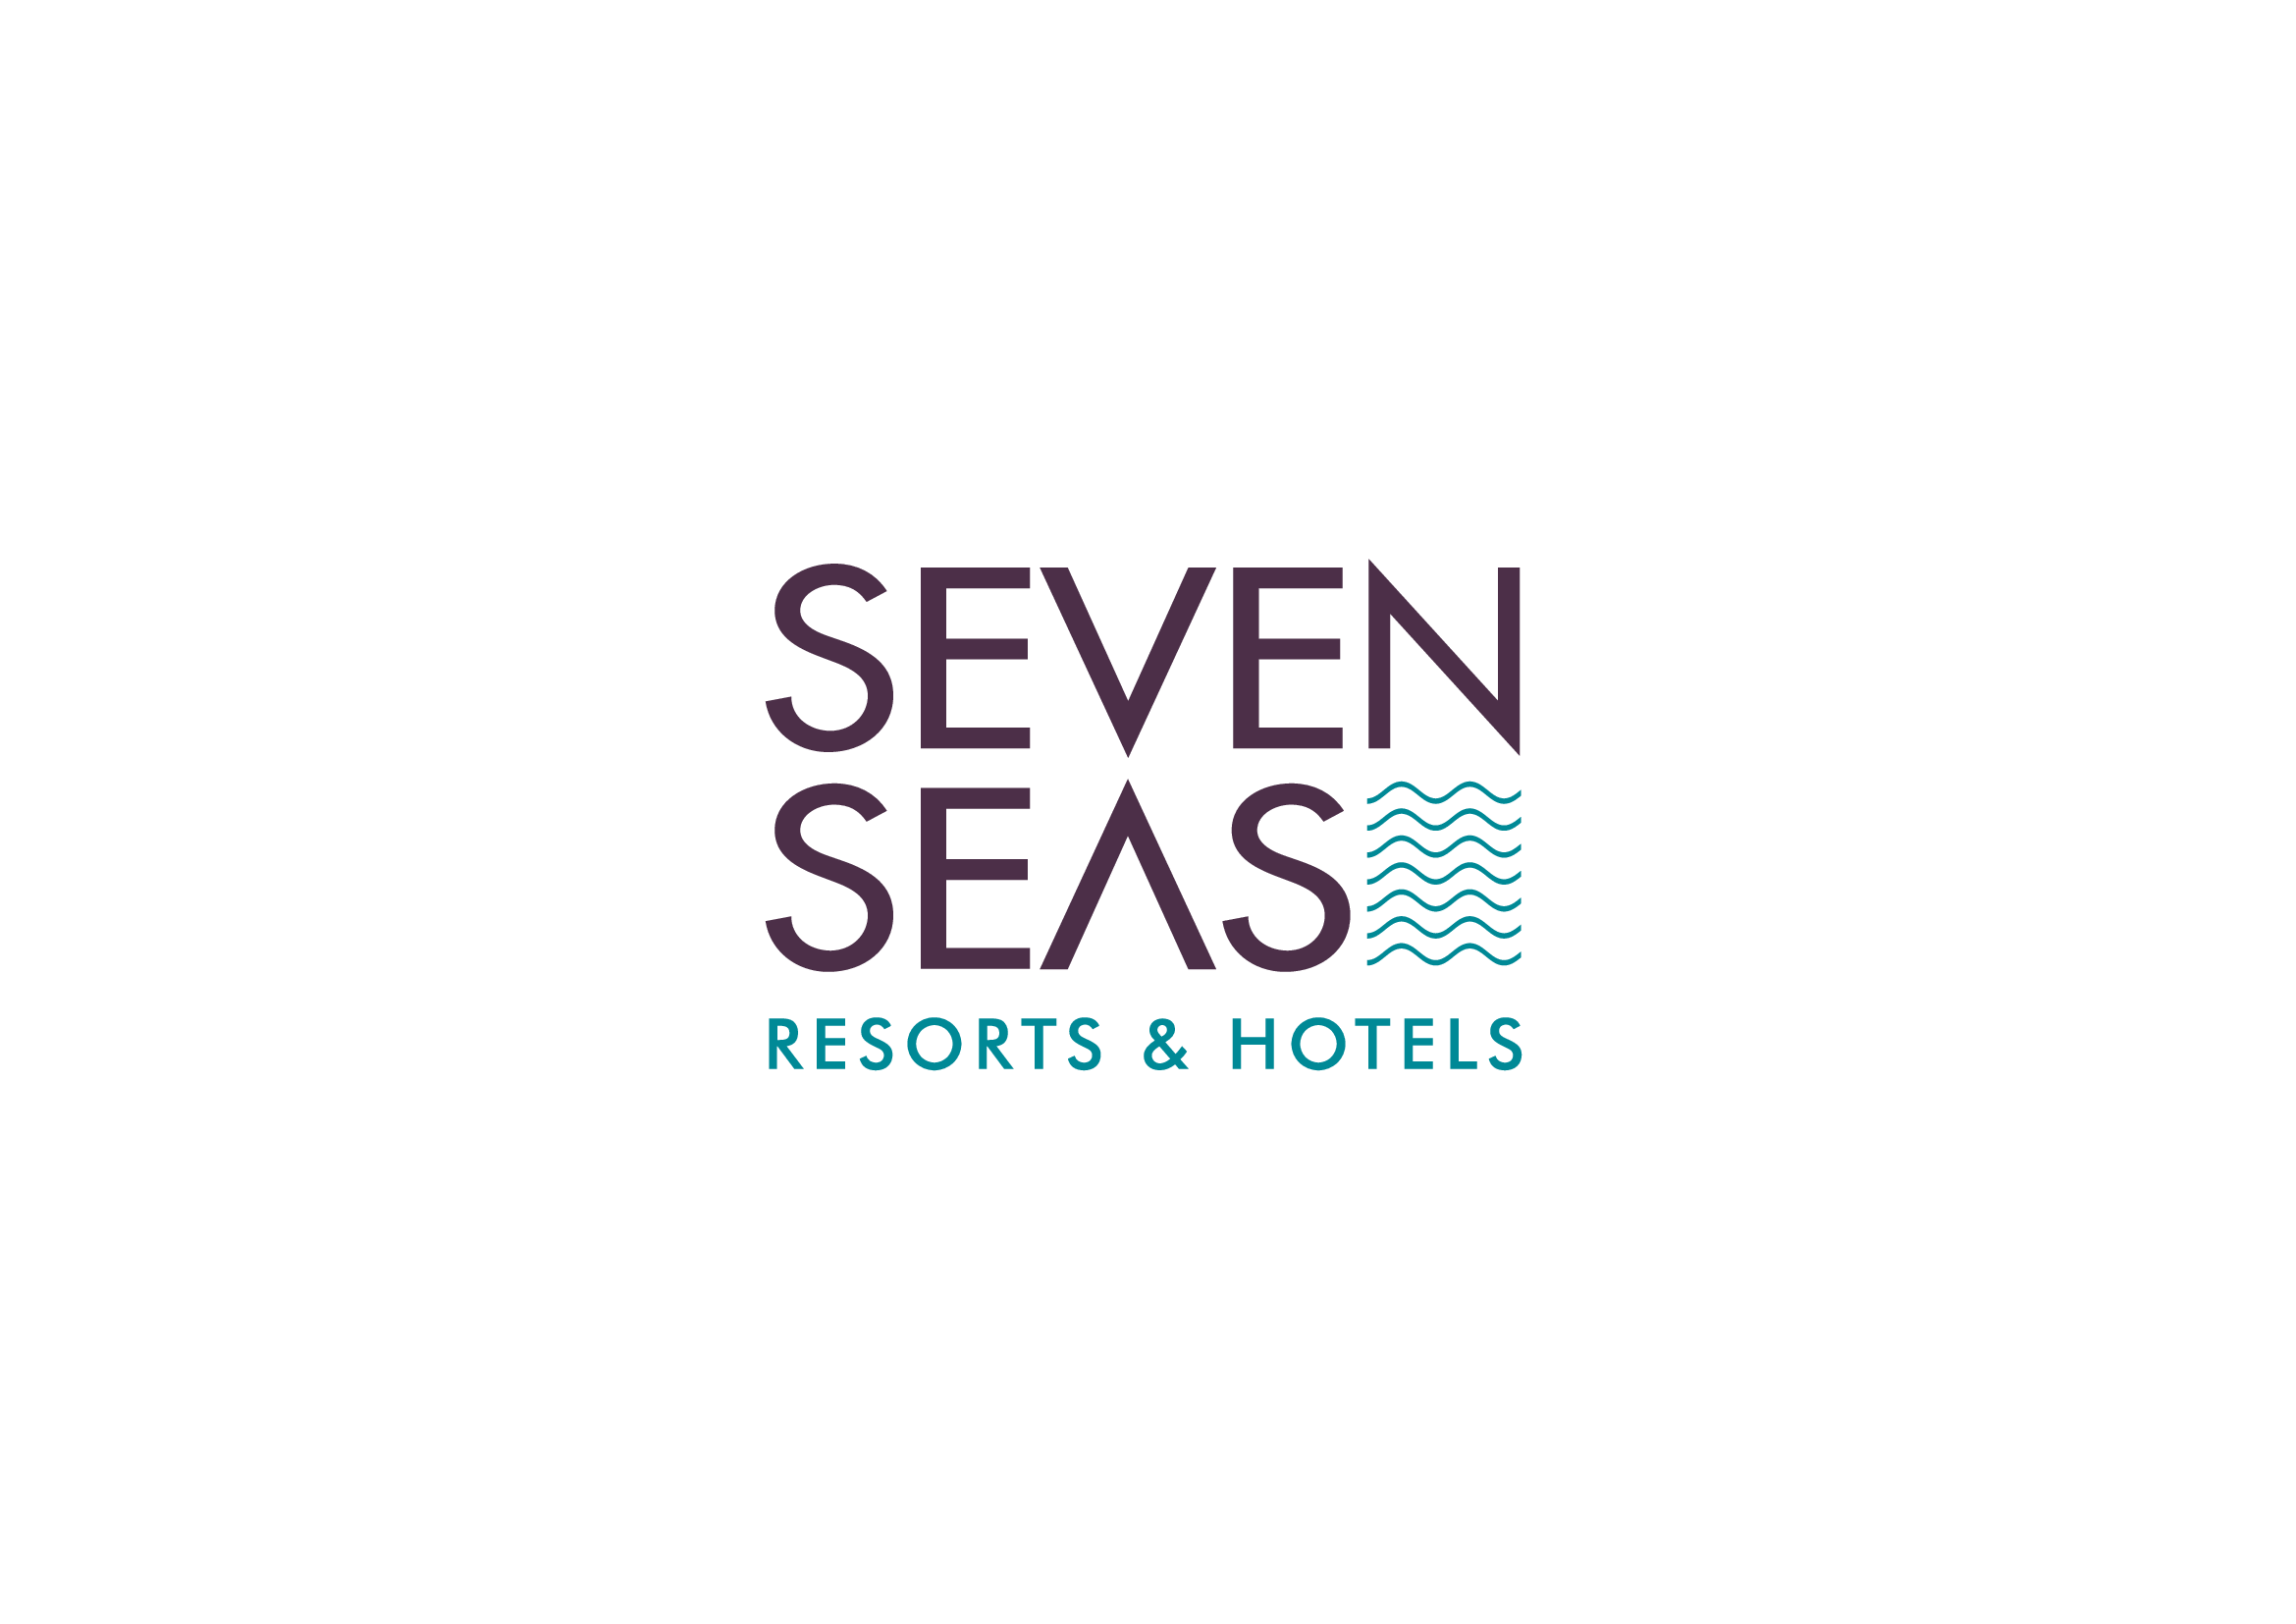 Seven Seas Resort & Hotels